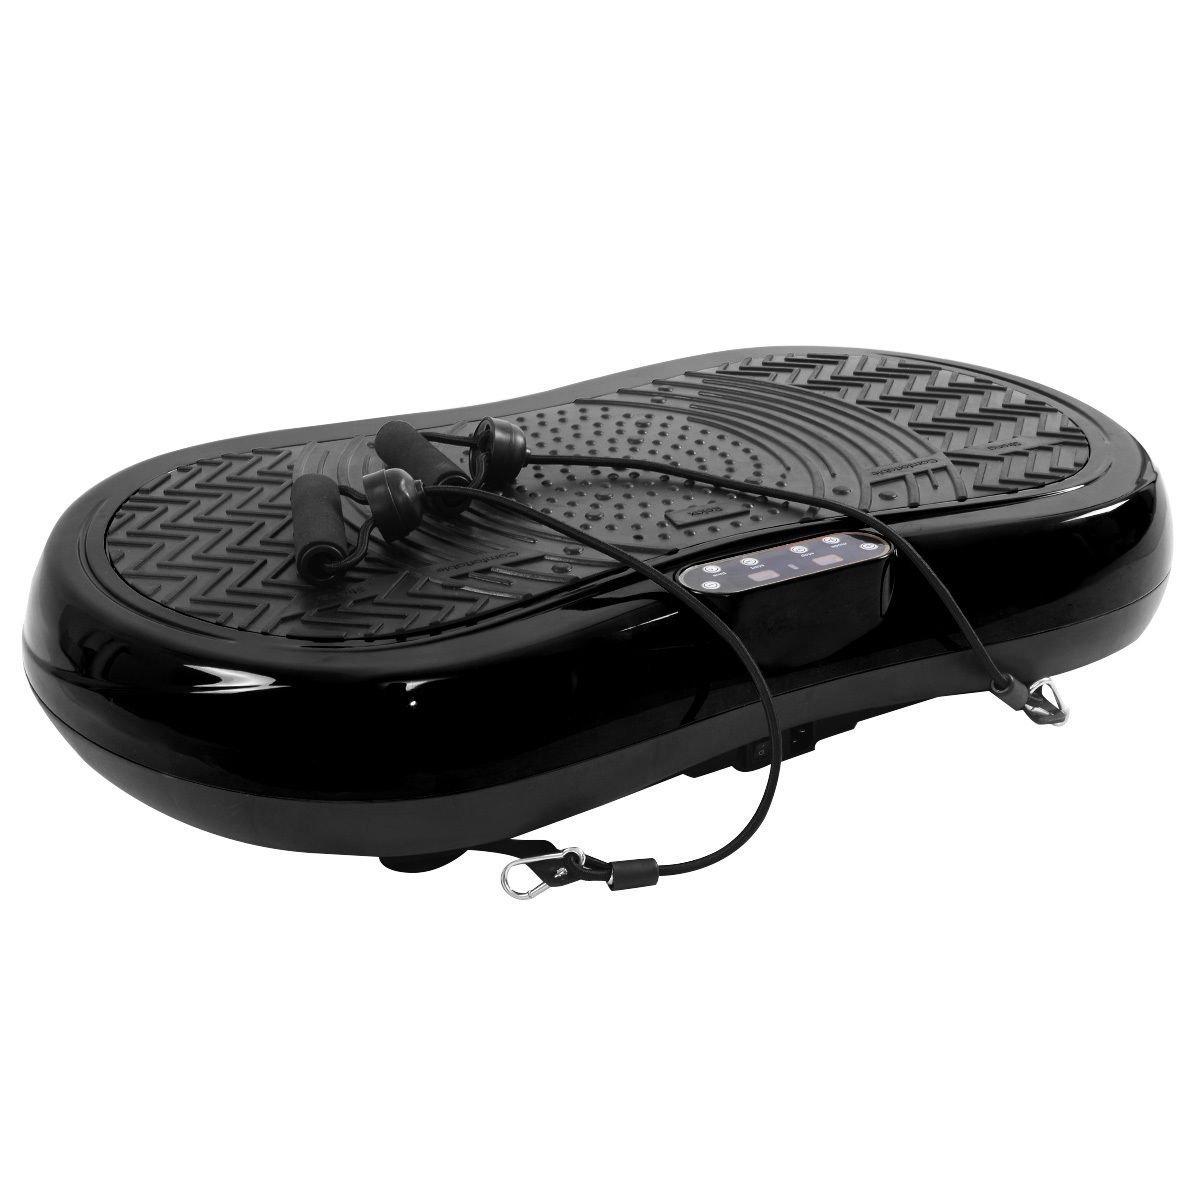 Tangkula Ultrathin Mini Crazy Fit Vibration Platform Massage Machine Fitness Gym (Black)